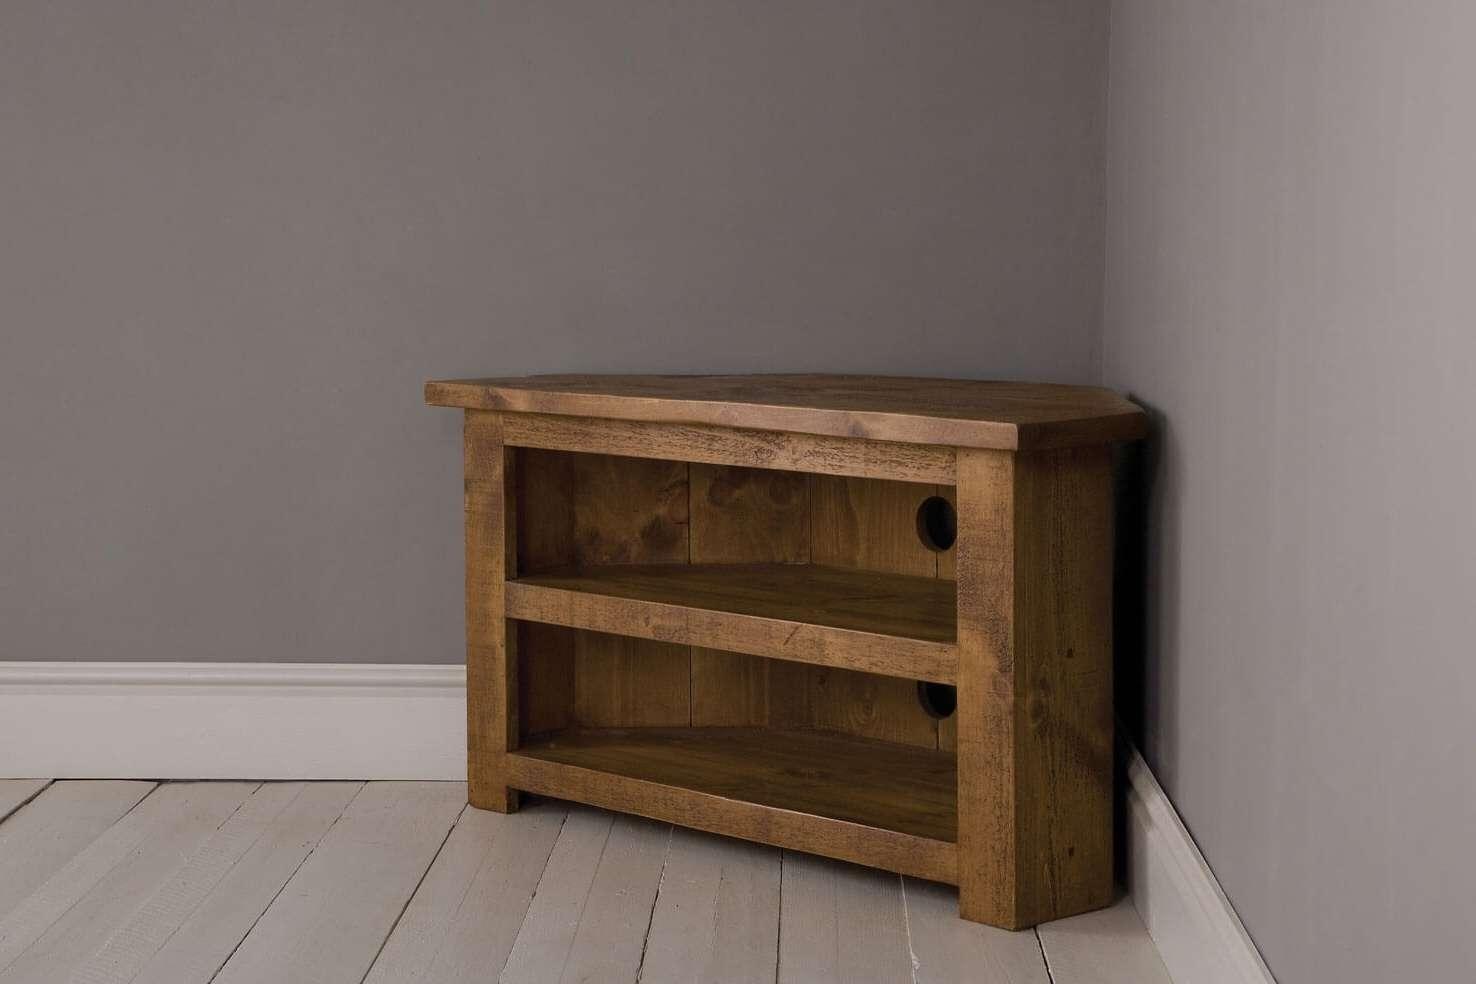 Plank Corner Tv Unit With Shelfindigo Furniture Inside Wood Corner Tv Cabinets (View 7 of 20)